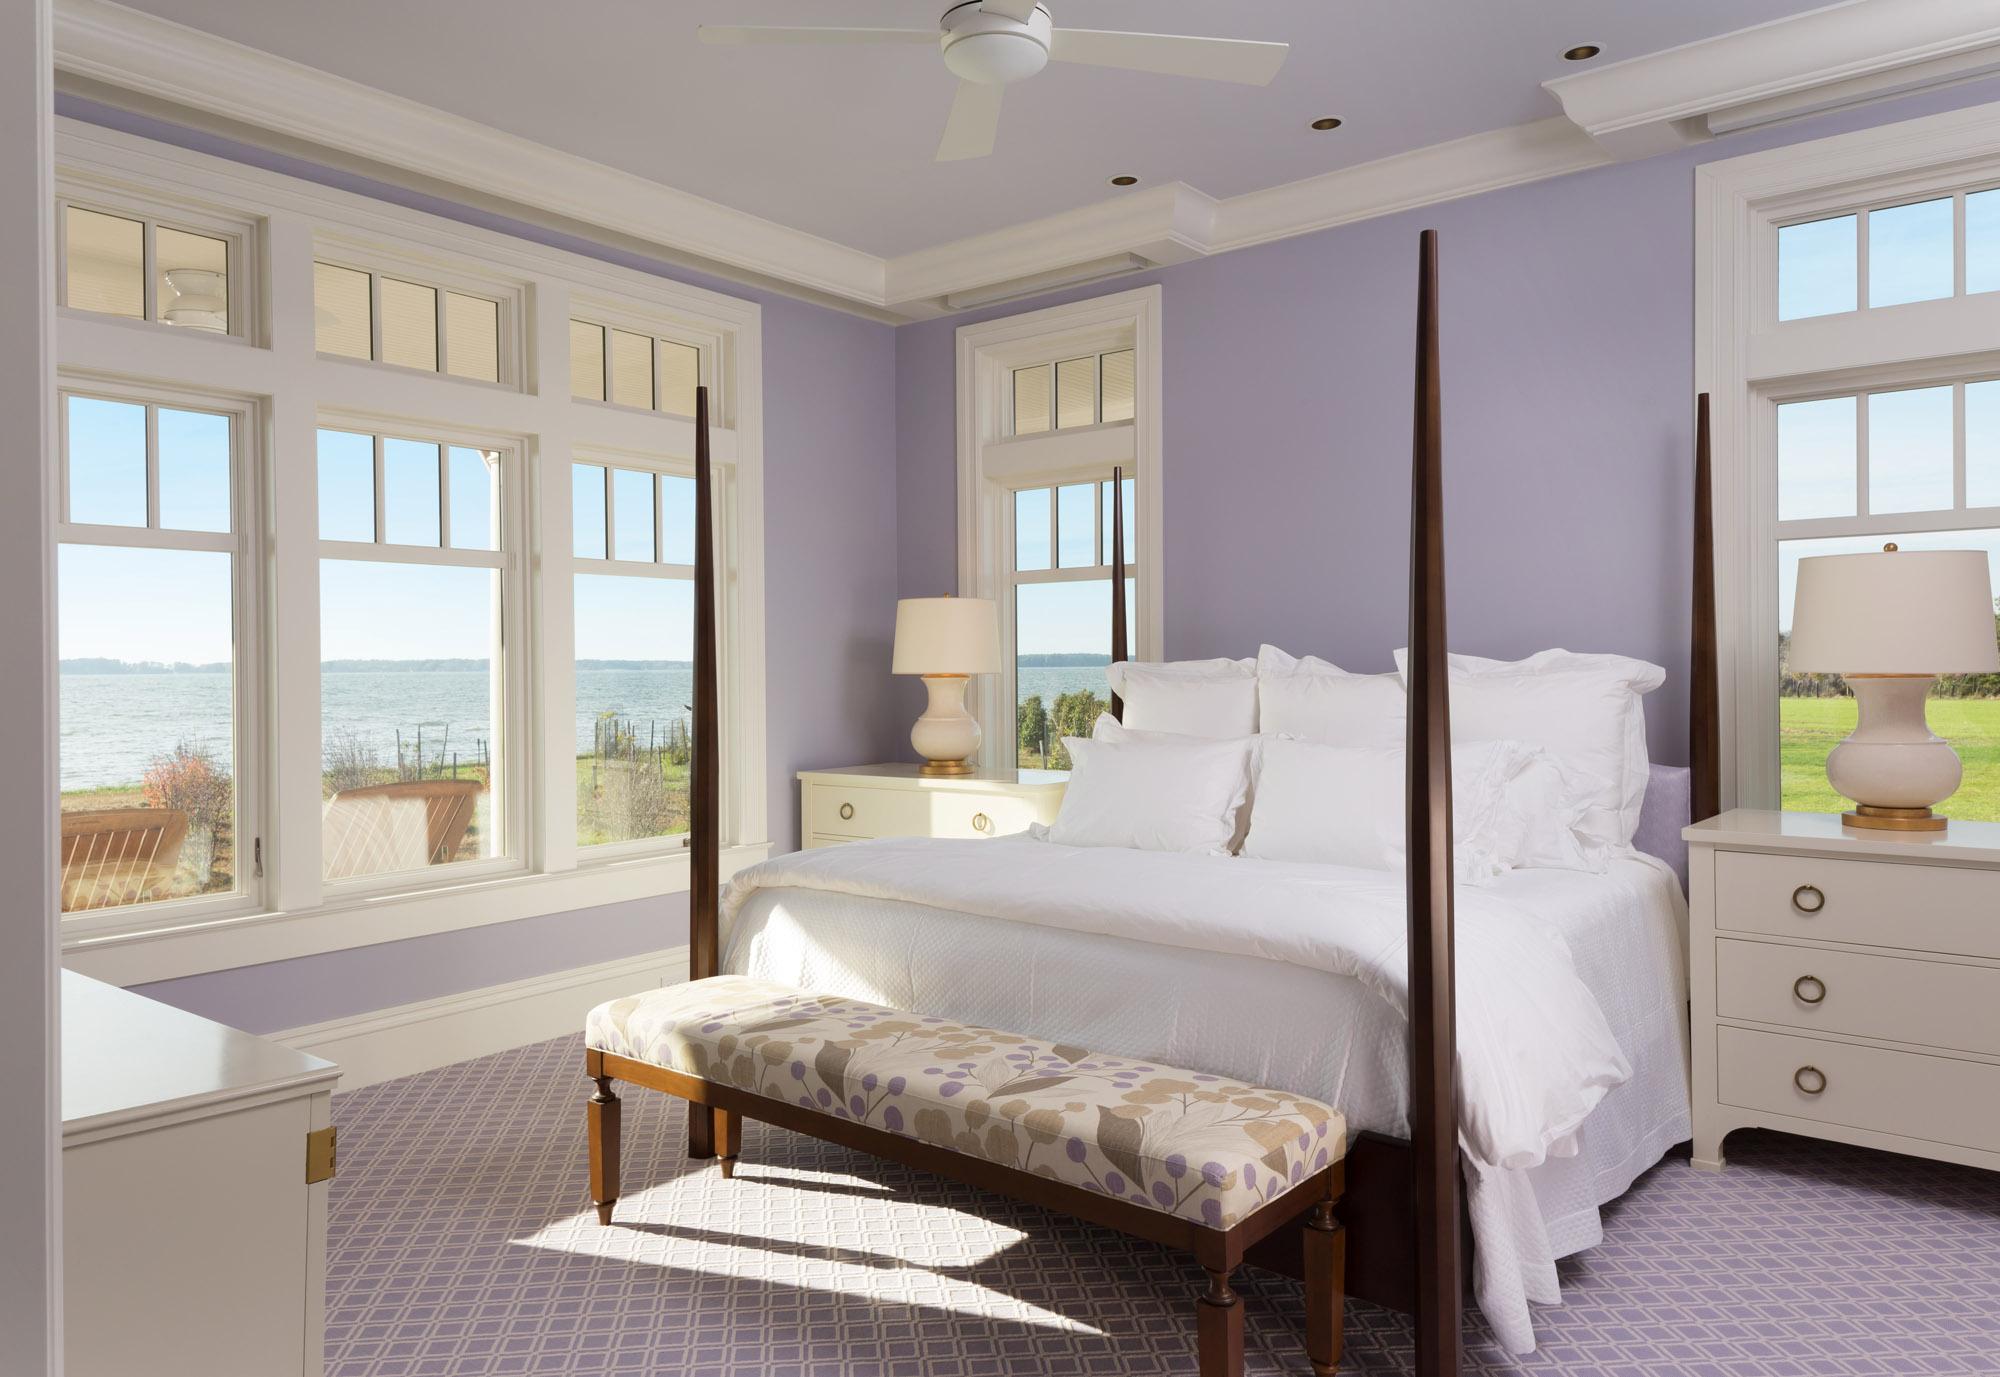 Bedroom-4429_original.jpg